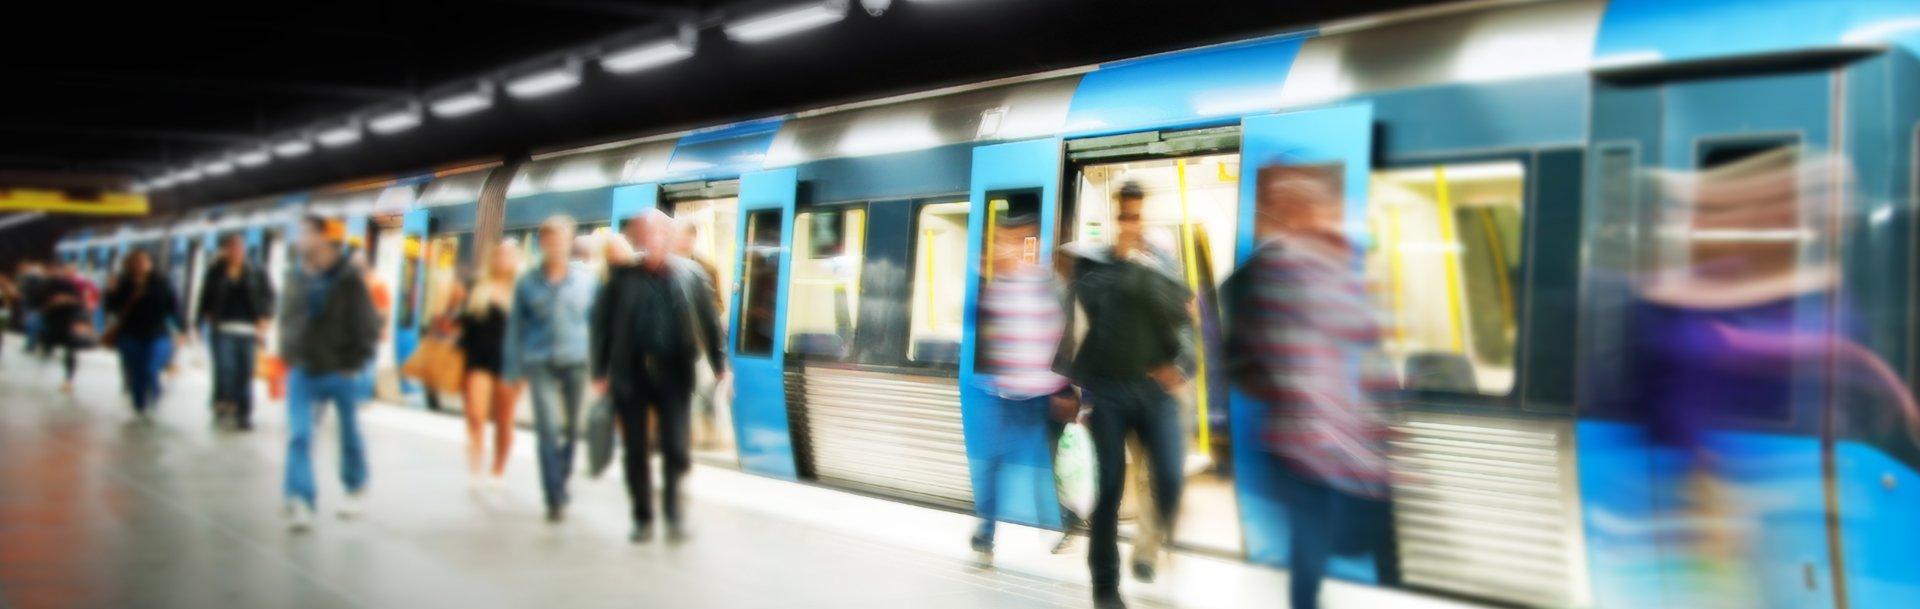 ITRP Series Transportation Panel PCs